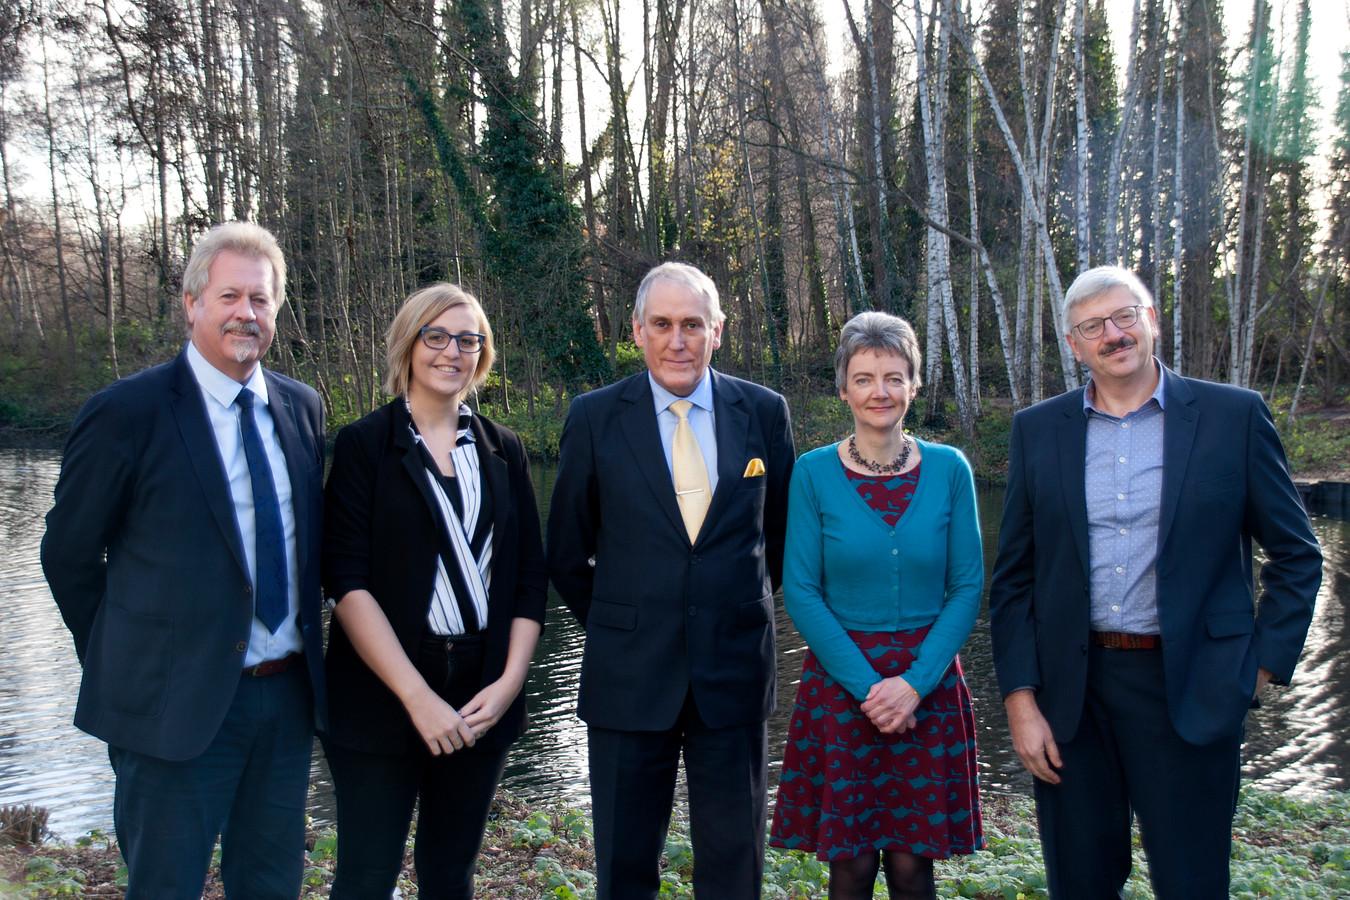 Gilbert Verstraelen (sp.a), Wendy Simons (N-VA), Luc Bungeneers (N-VA), Sonja De Meyer (CD&V) en Patrick Van den Bempt (N-VA).